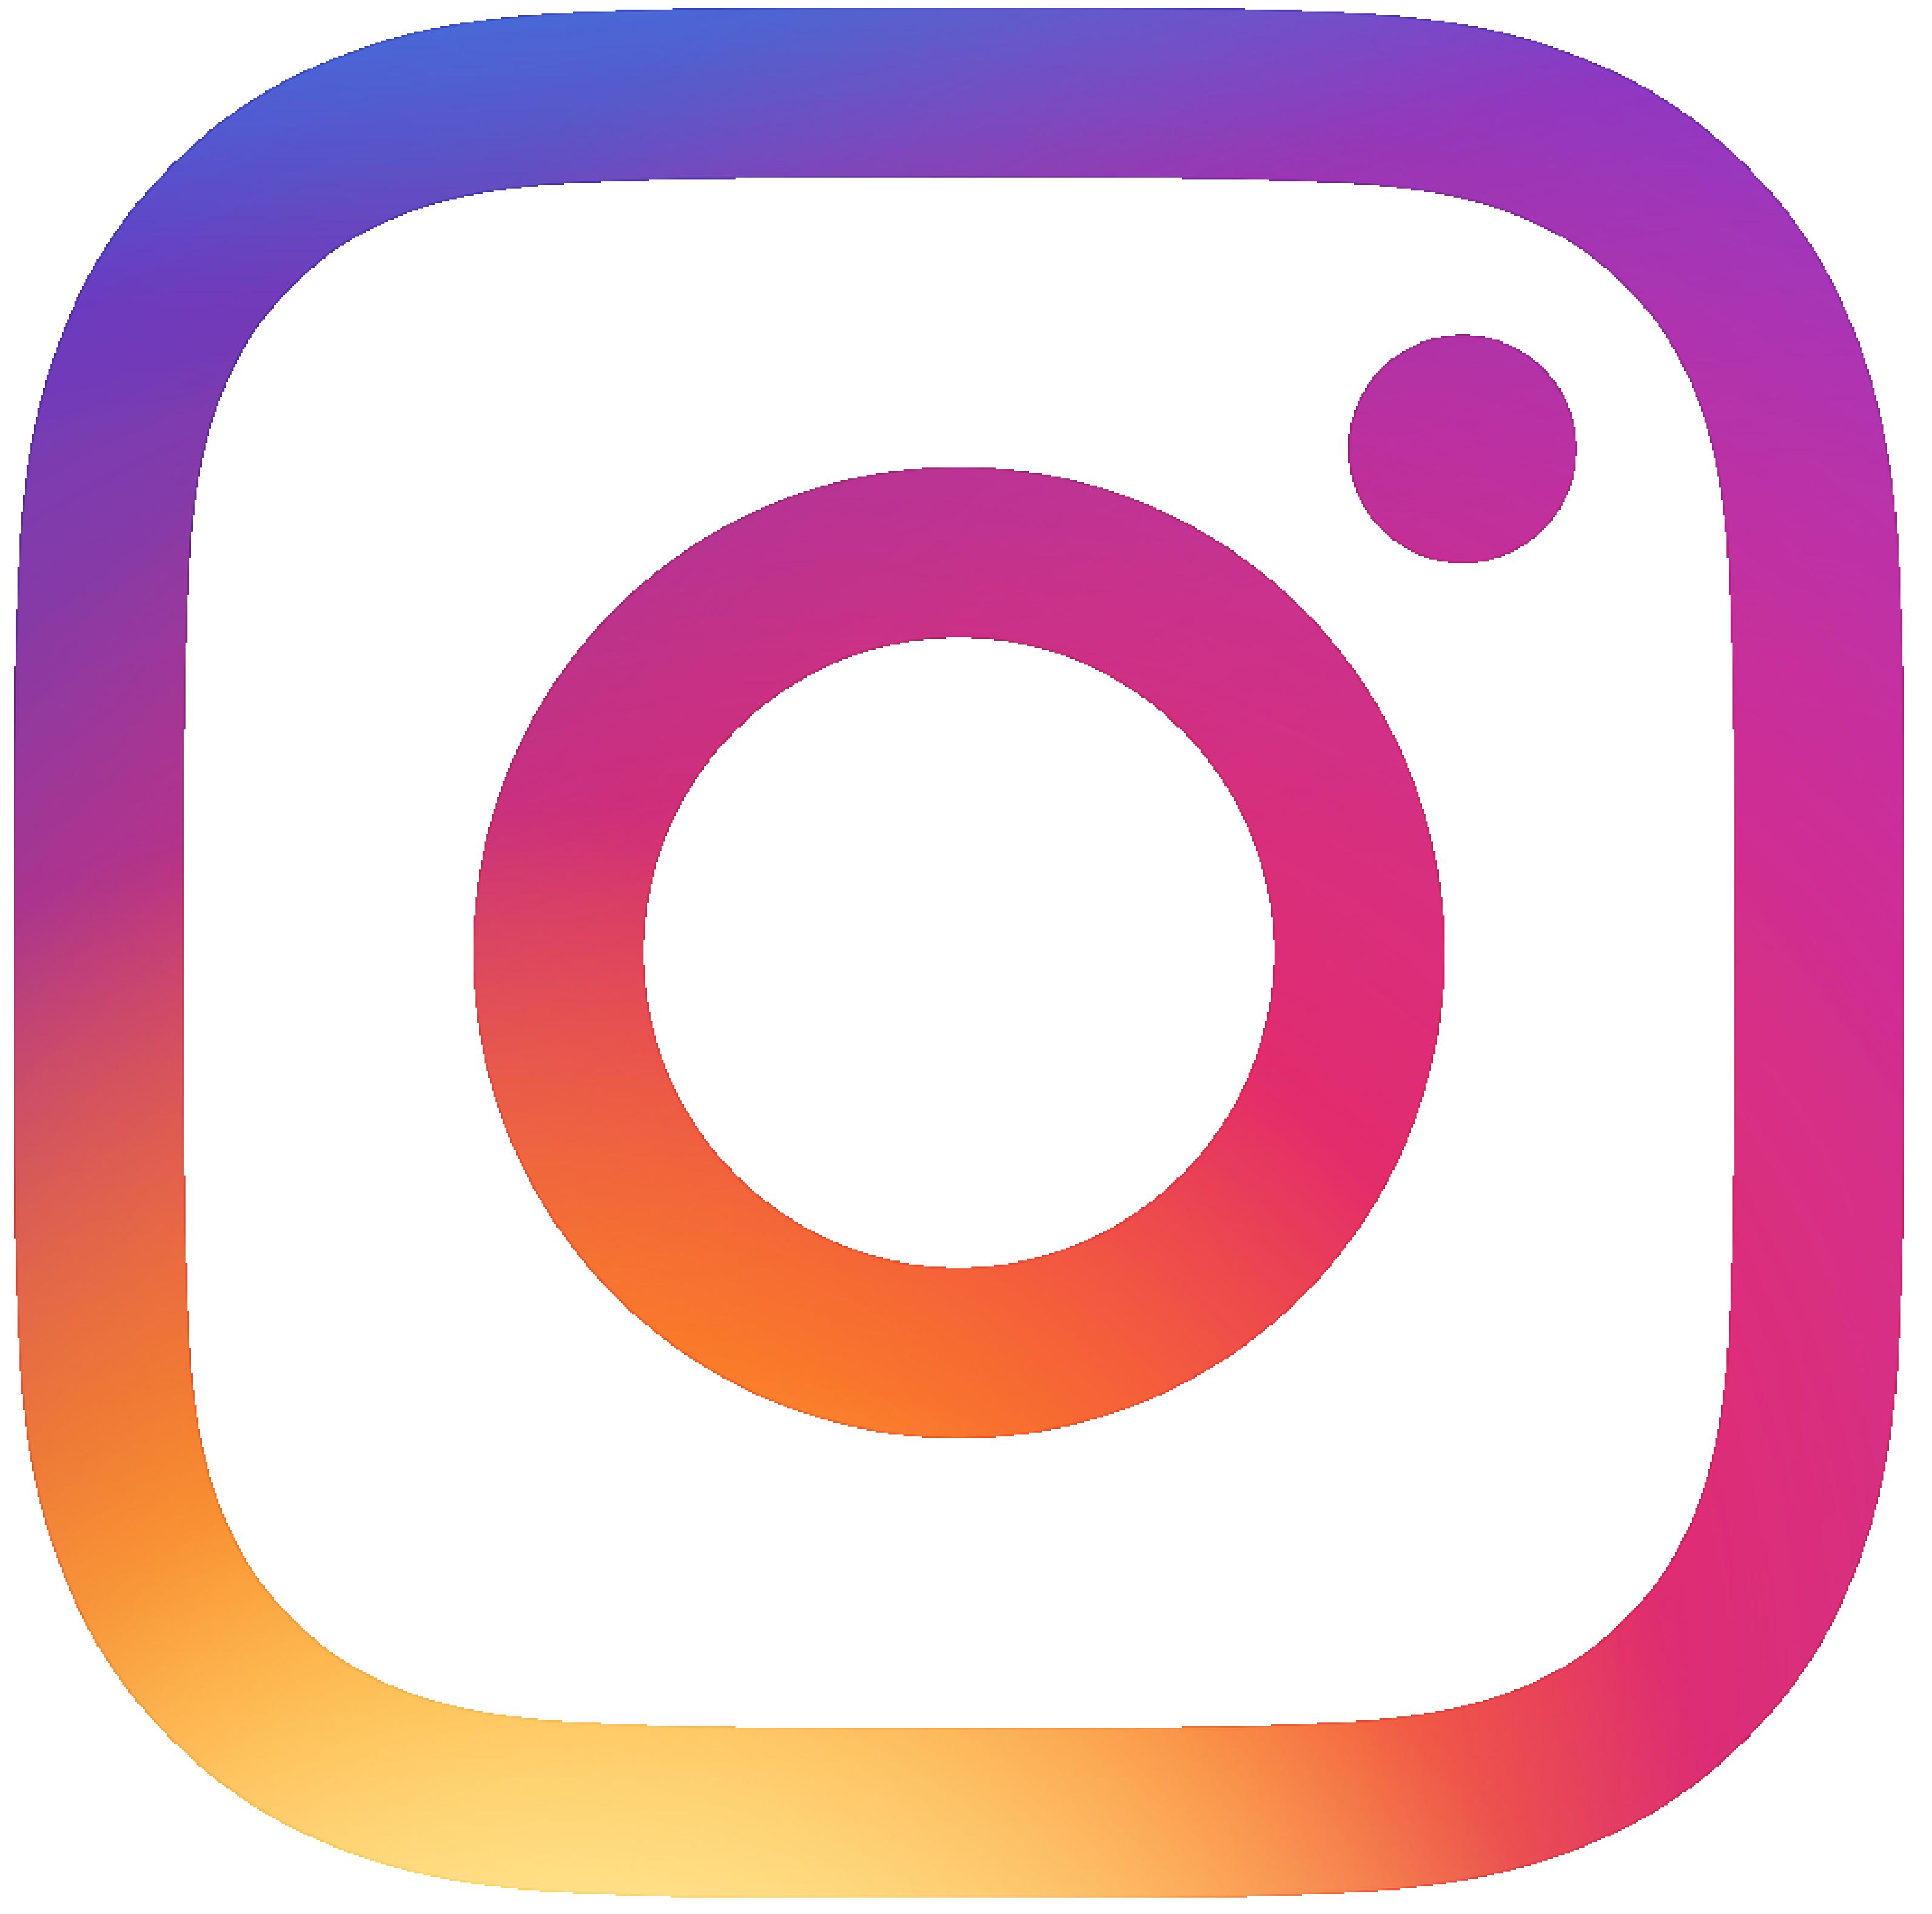 Free PNG Instagram logo.